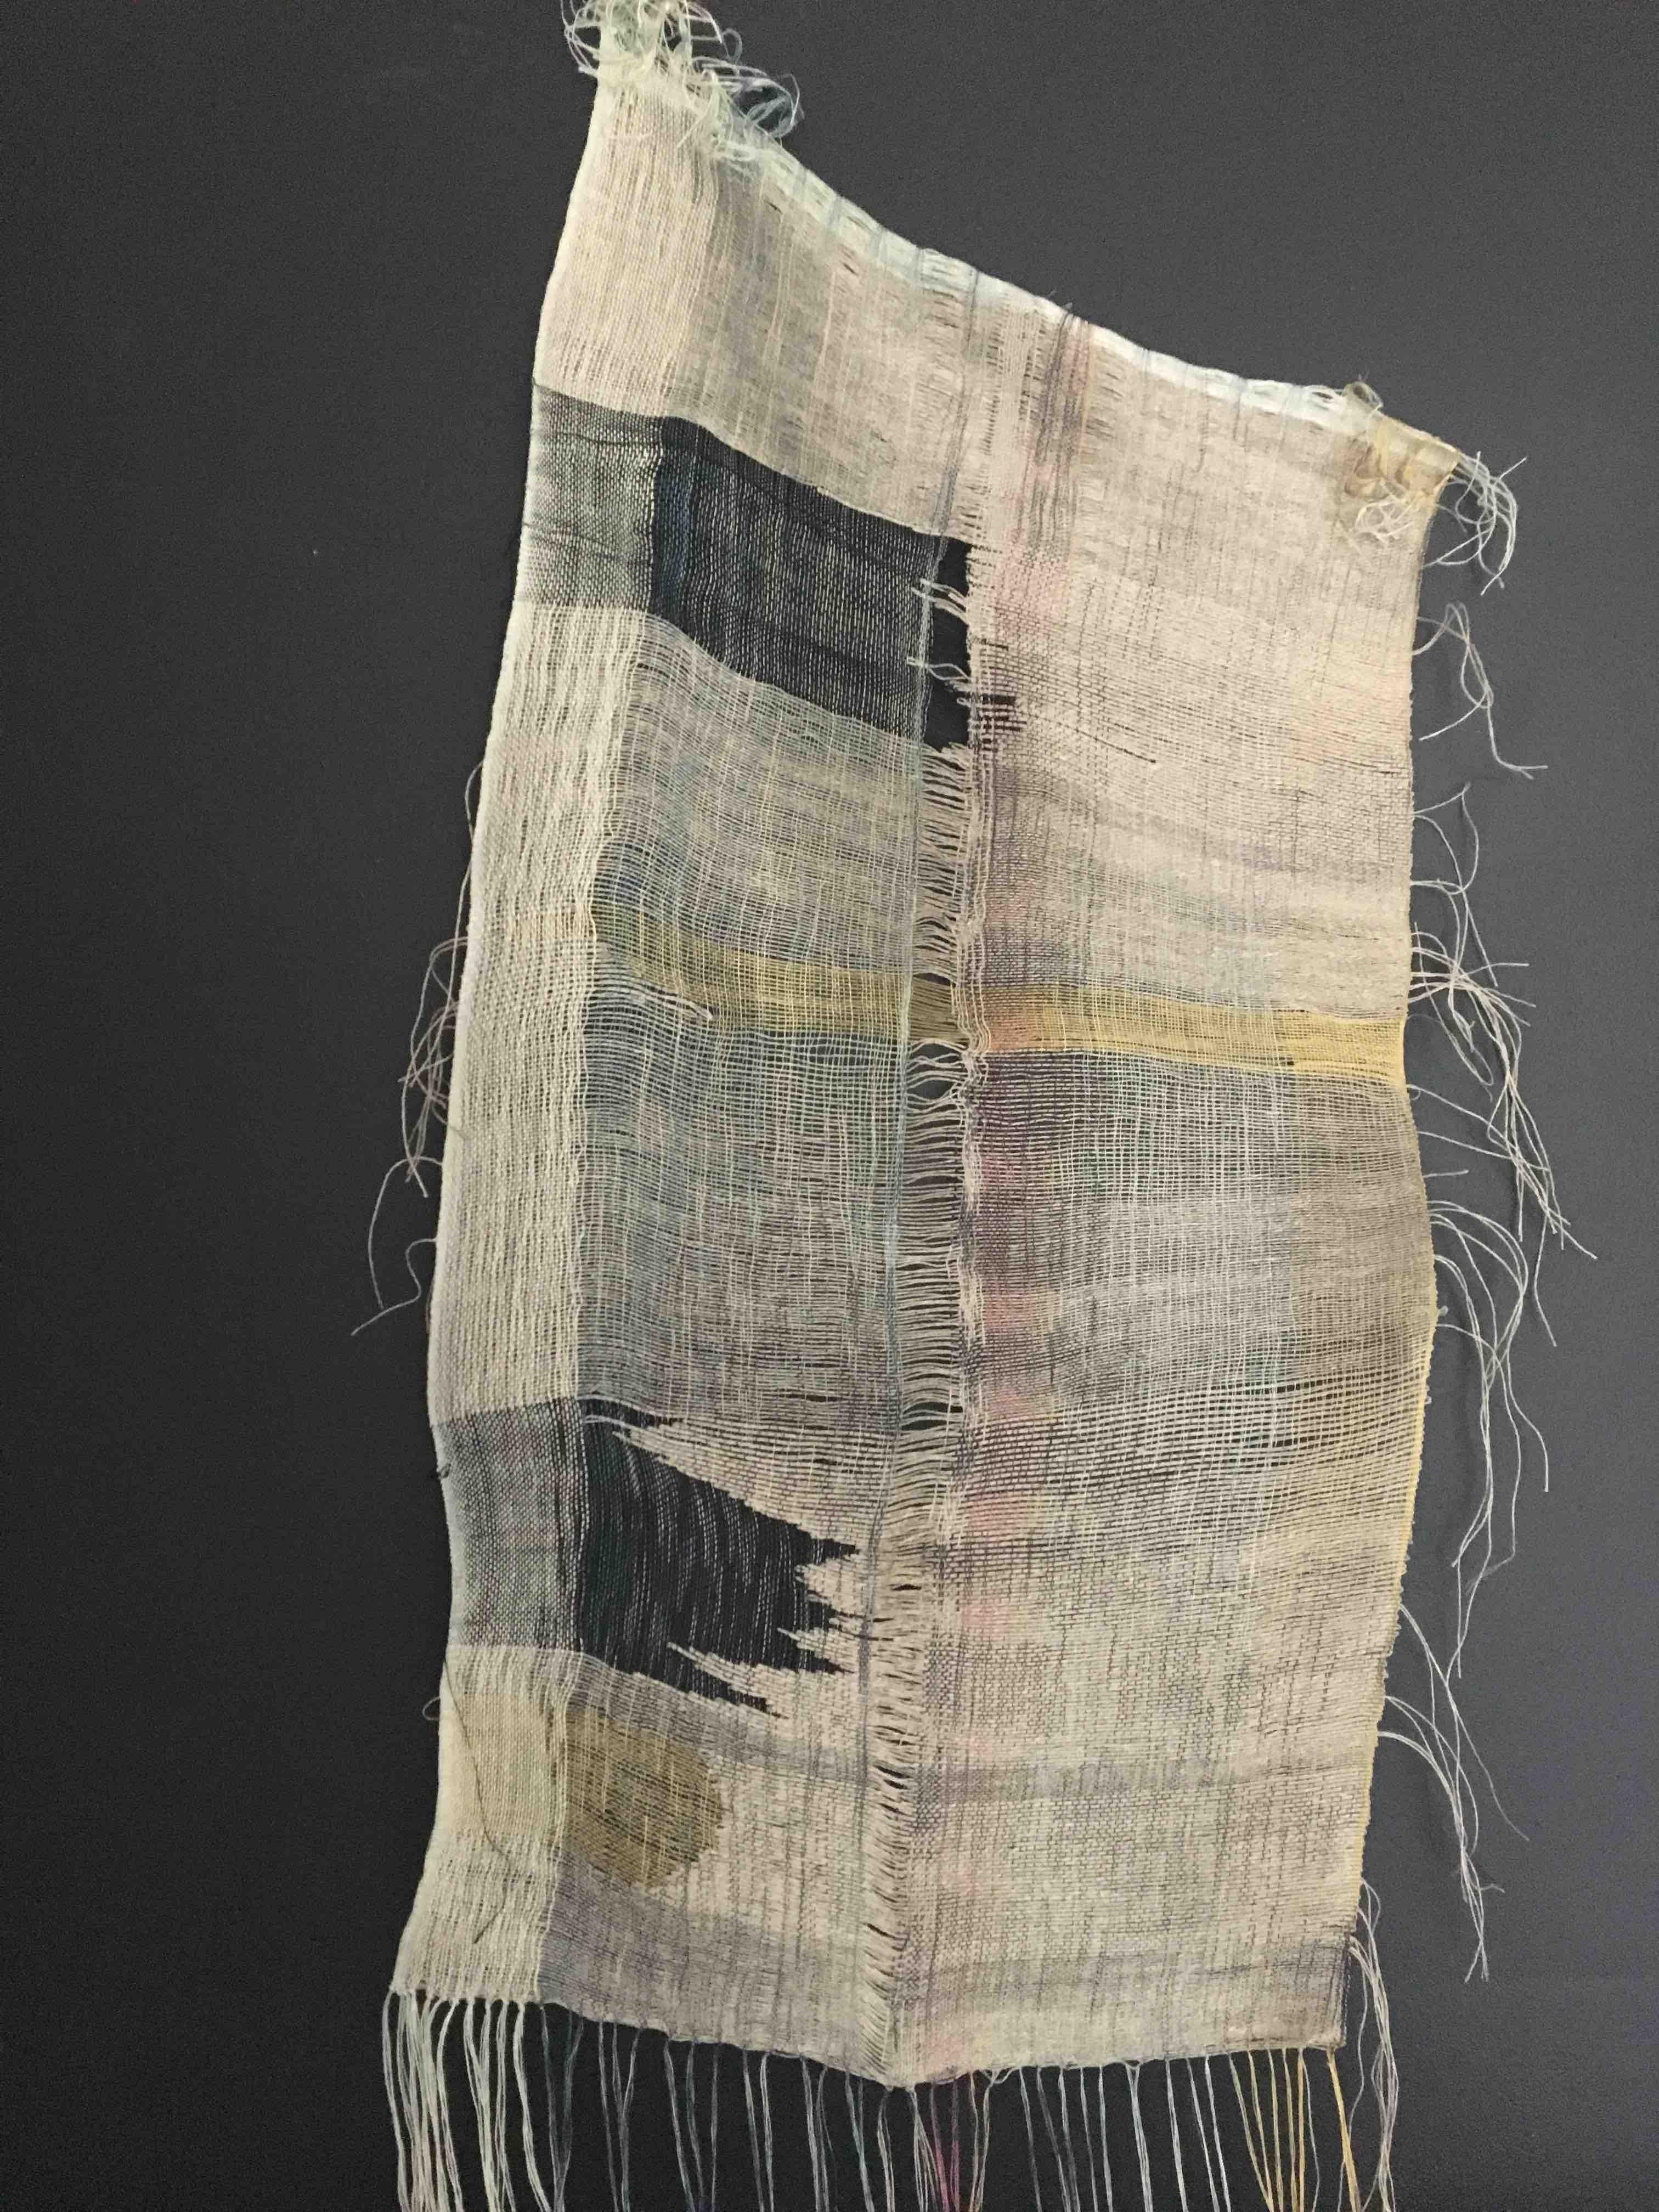 Vlieseline fine art textiles award exhibition